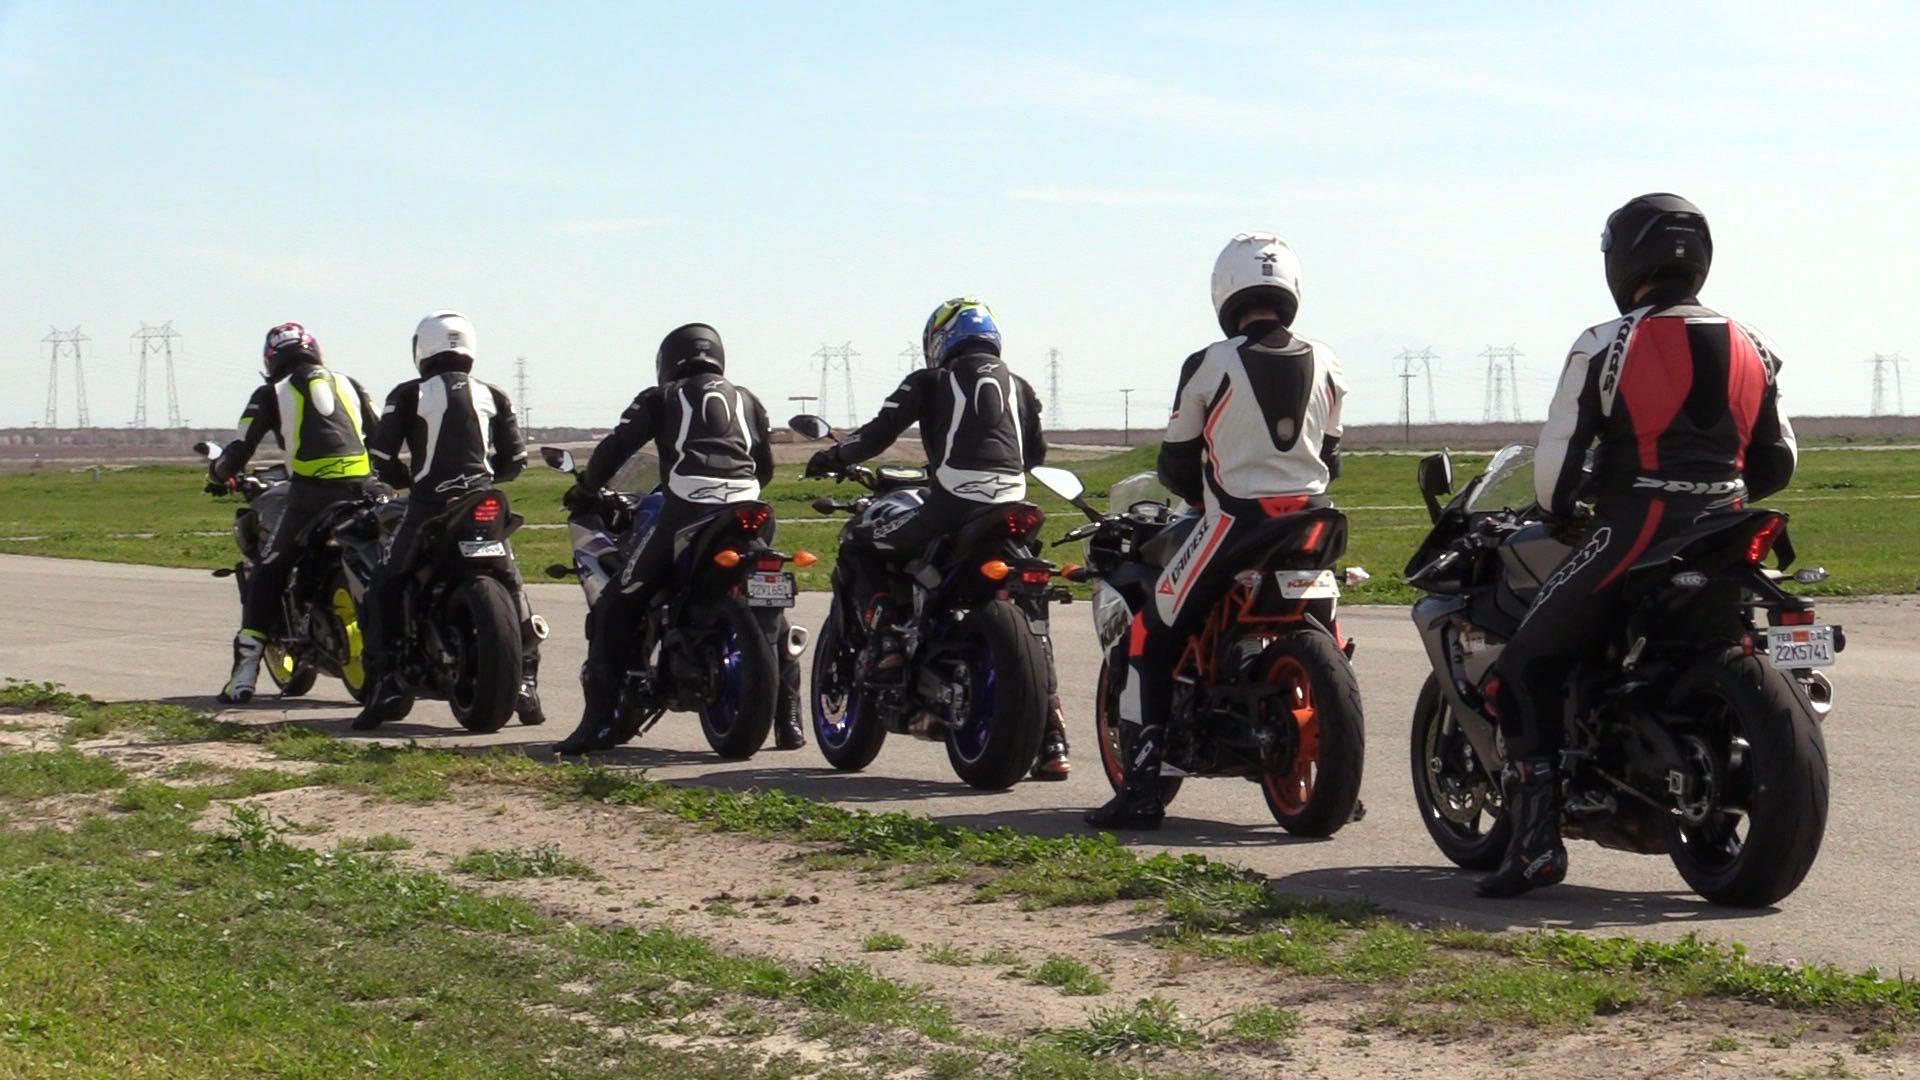 Yamaha Champions Riding School Grid Lineup